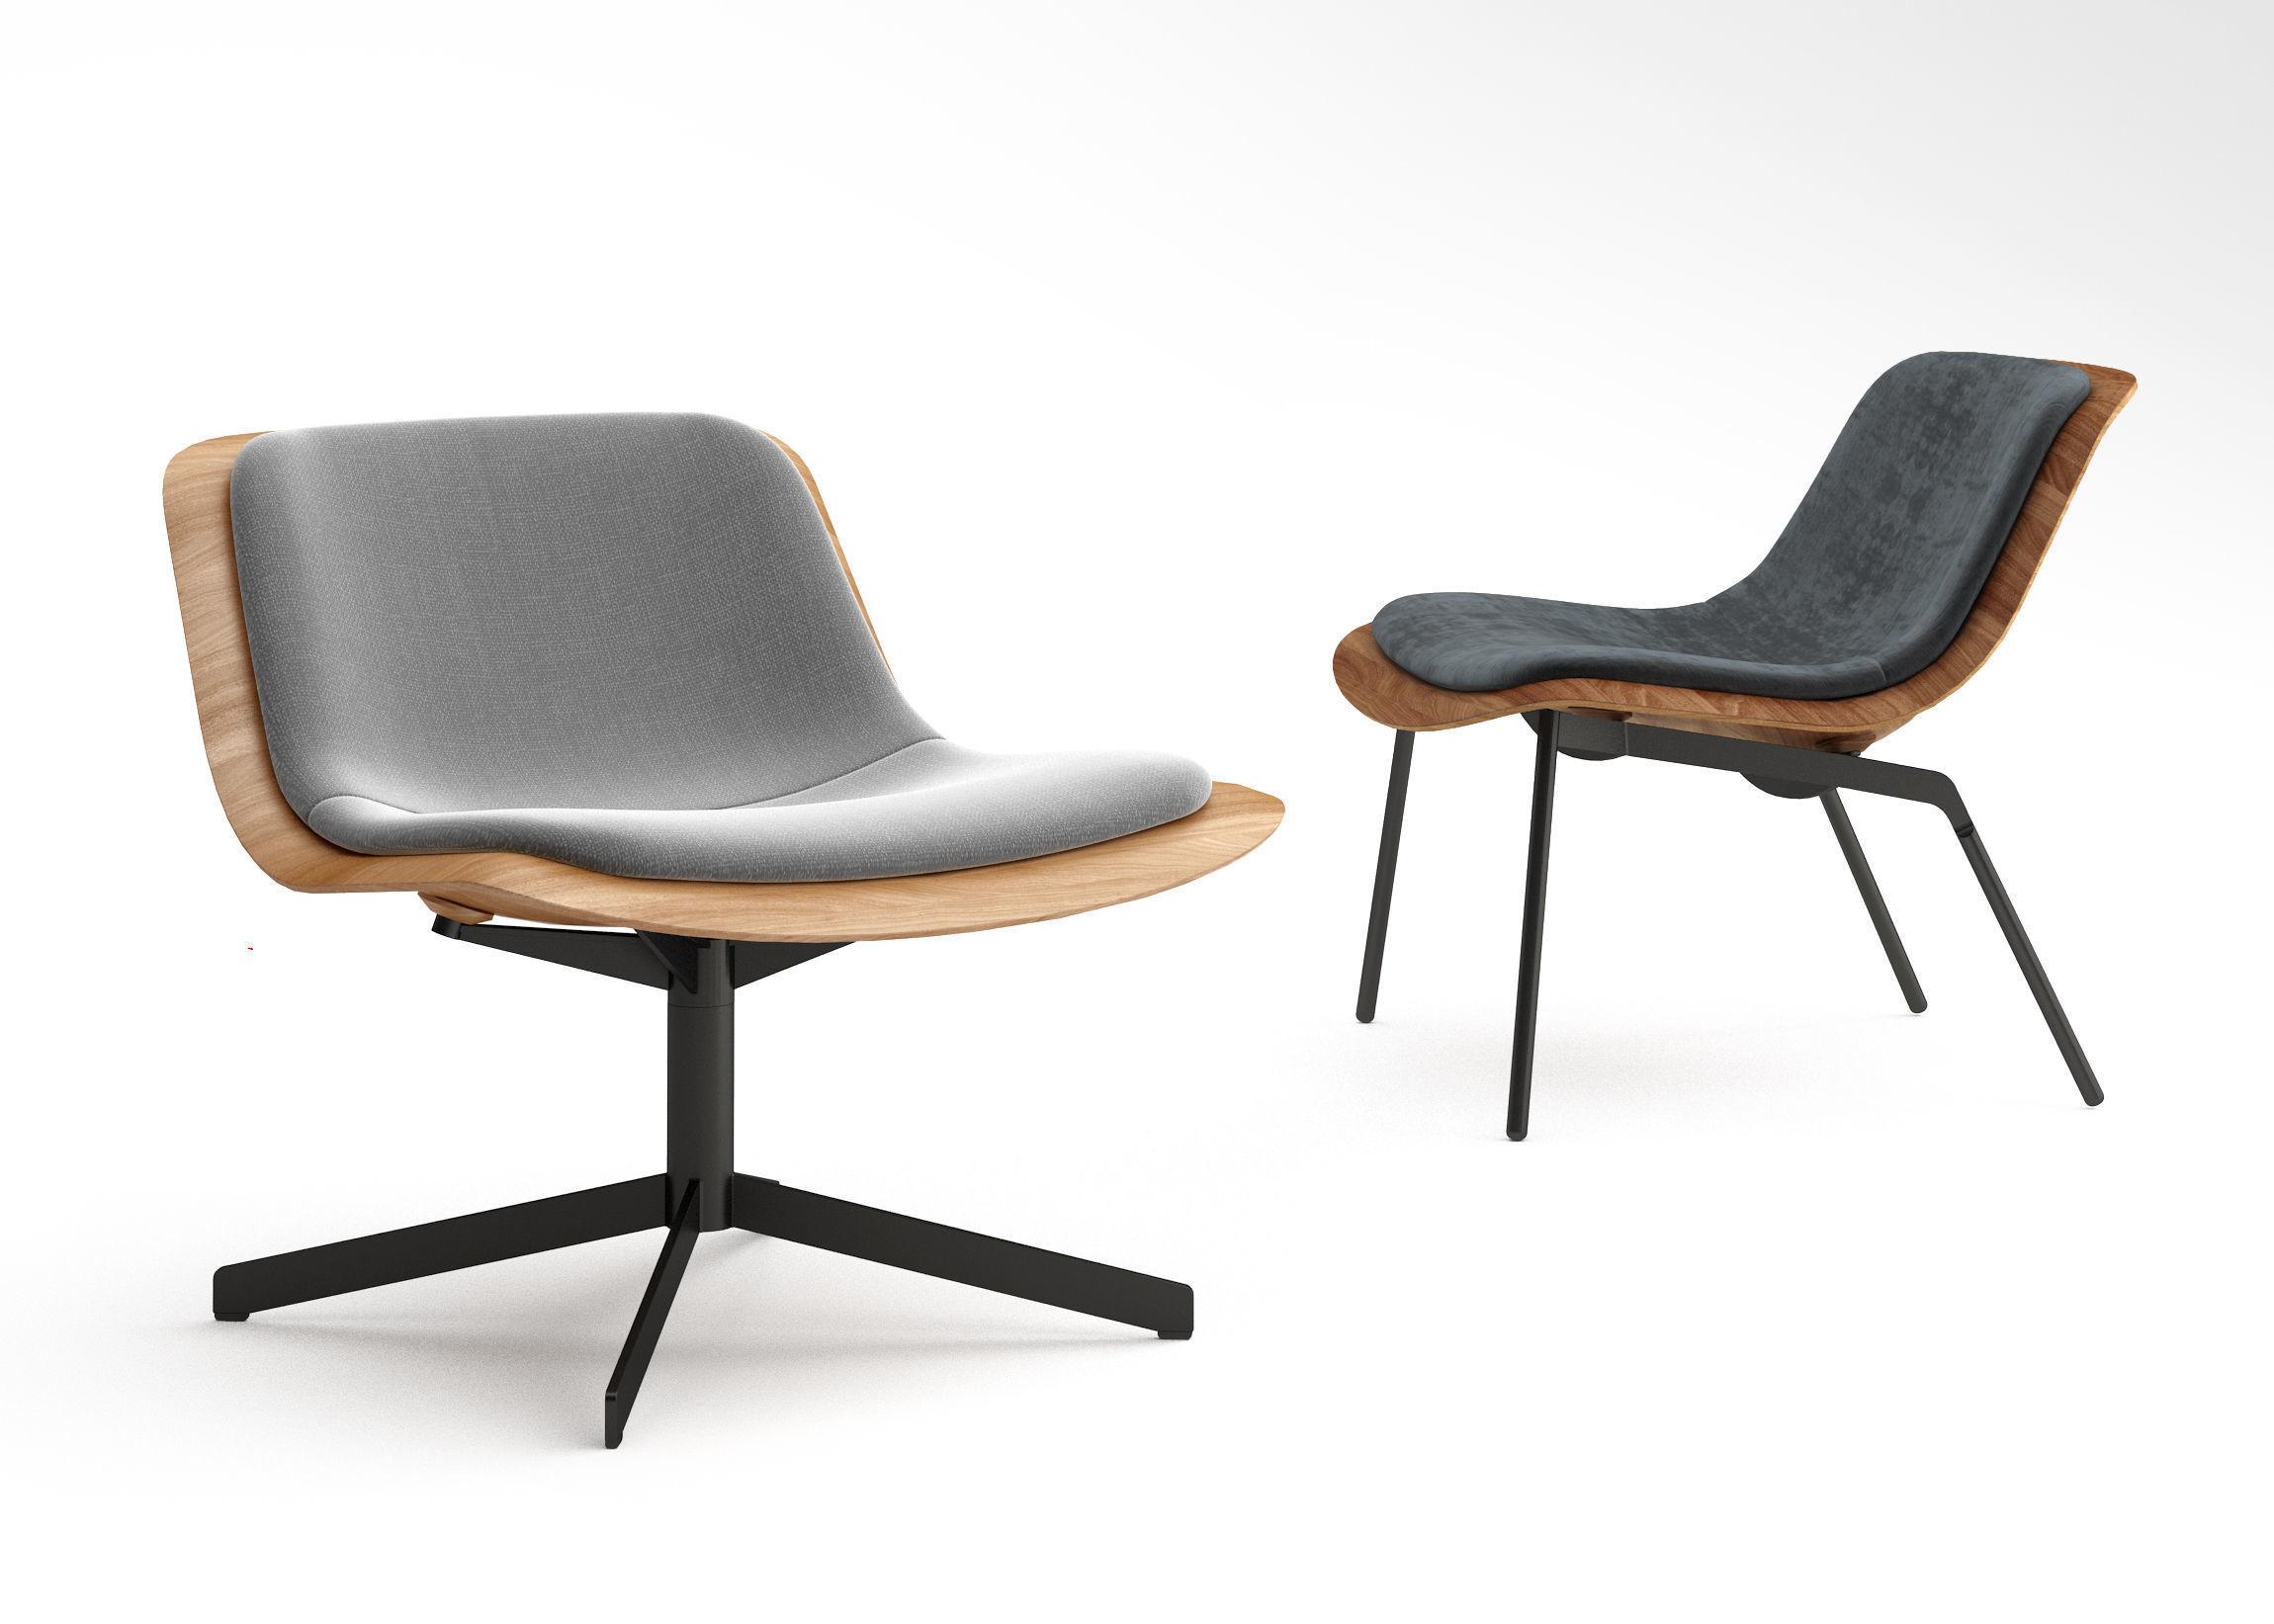 Wondrous Bludot Nonesuch Leather Lounge Chair 3D Model Creativecarmelina Interior Chair Design Creativecarmelinacom